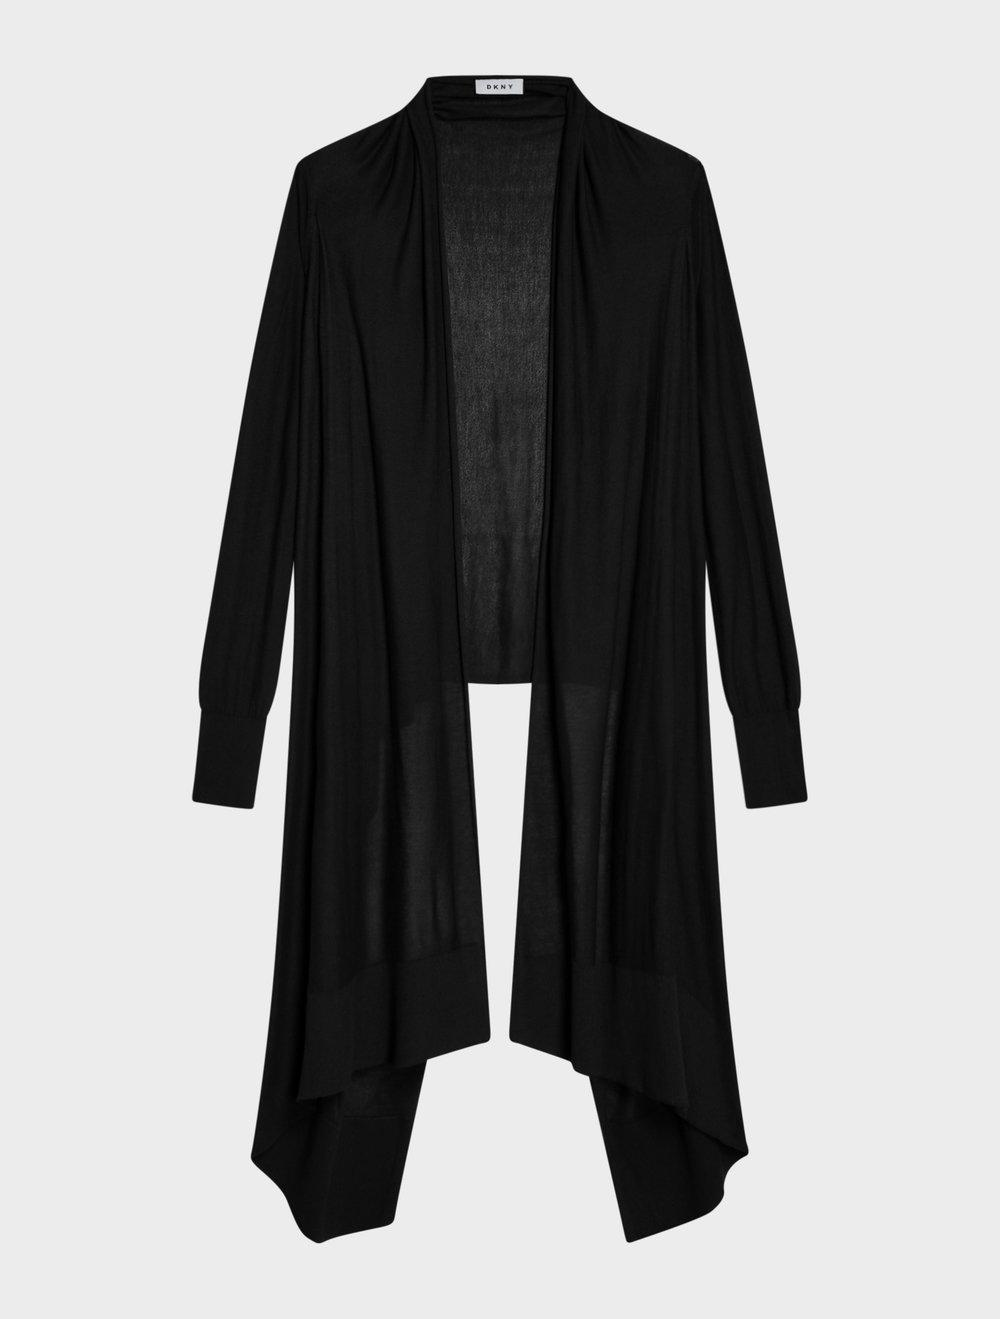 Dkny Long Sleeve Cozy Cardigan In Black